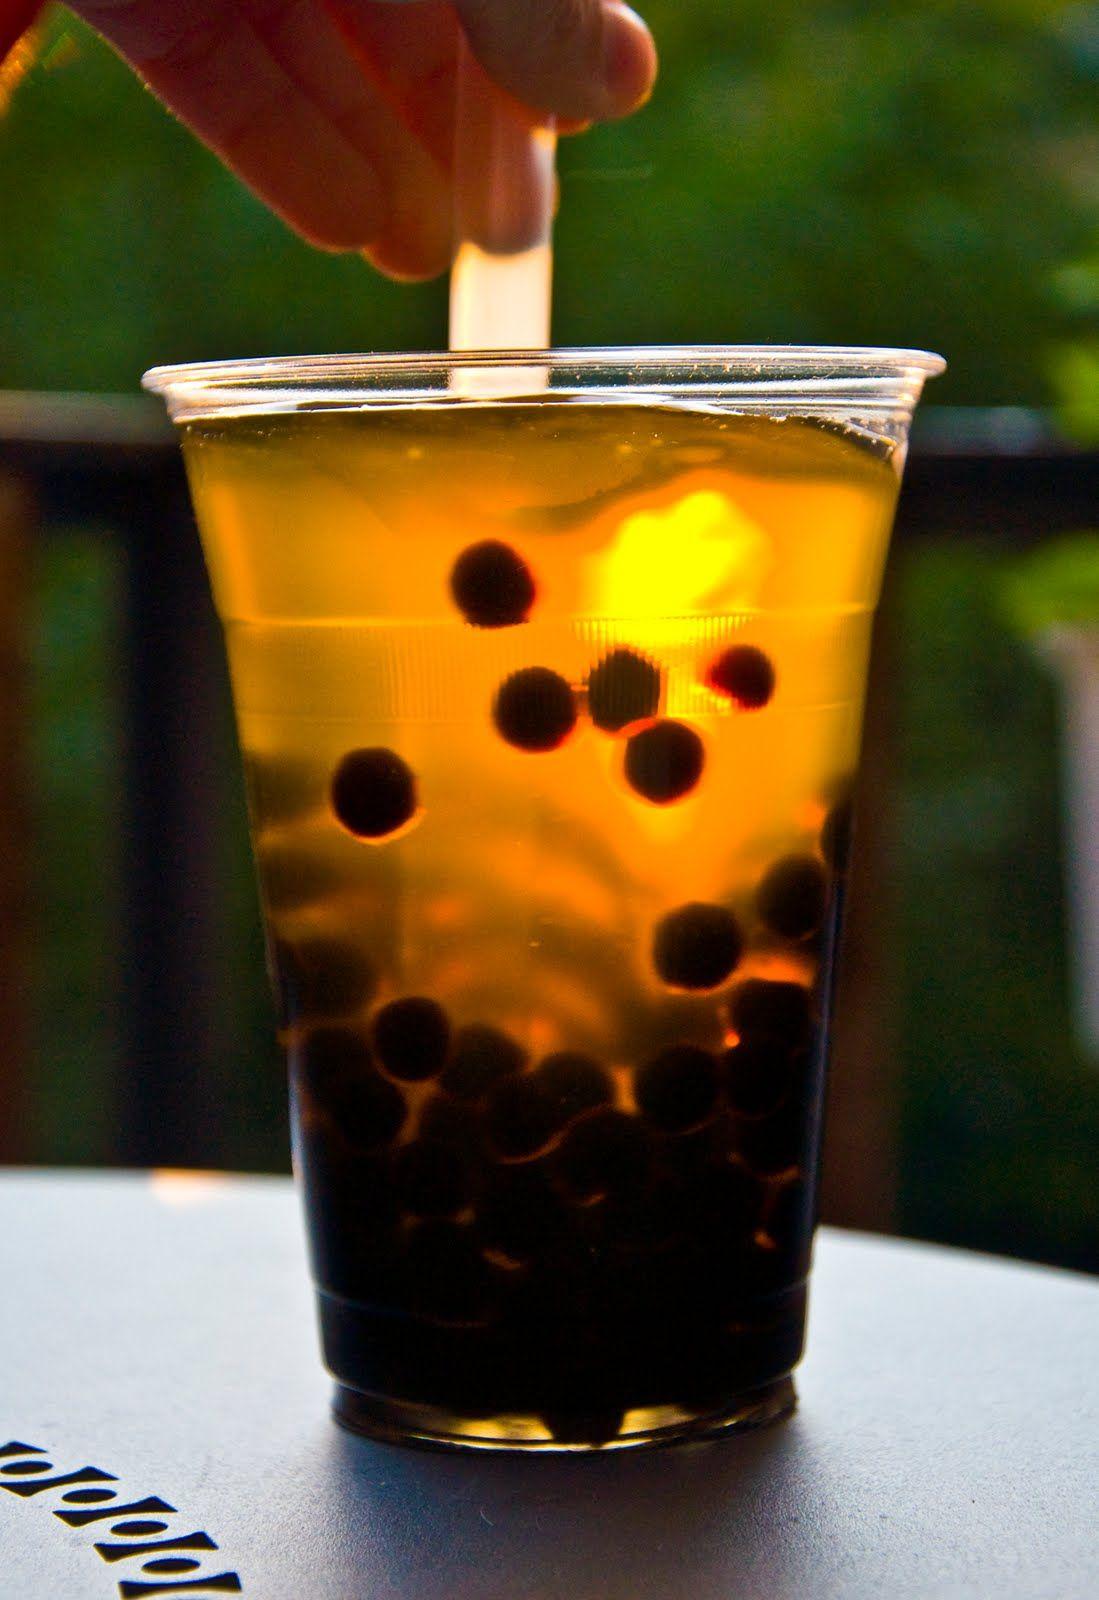 Bubble tea bubble tea bubble tea boba iced green tea